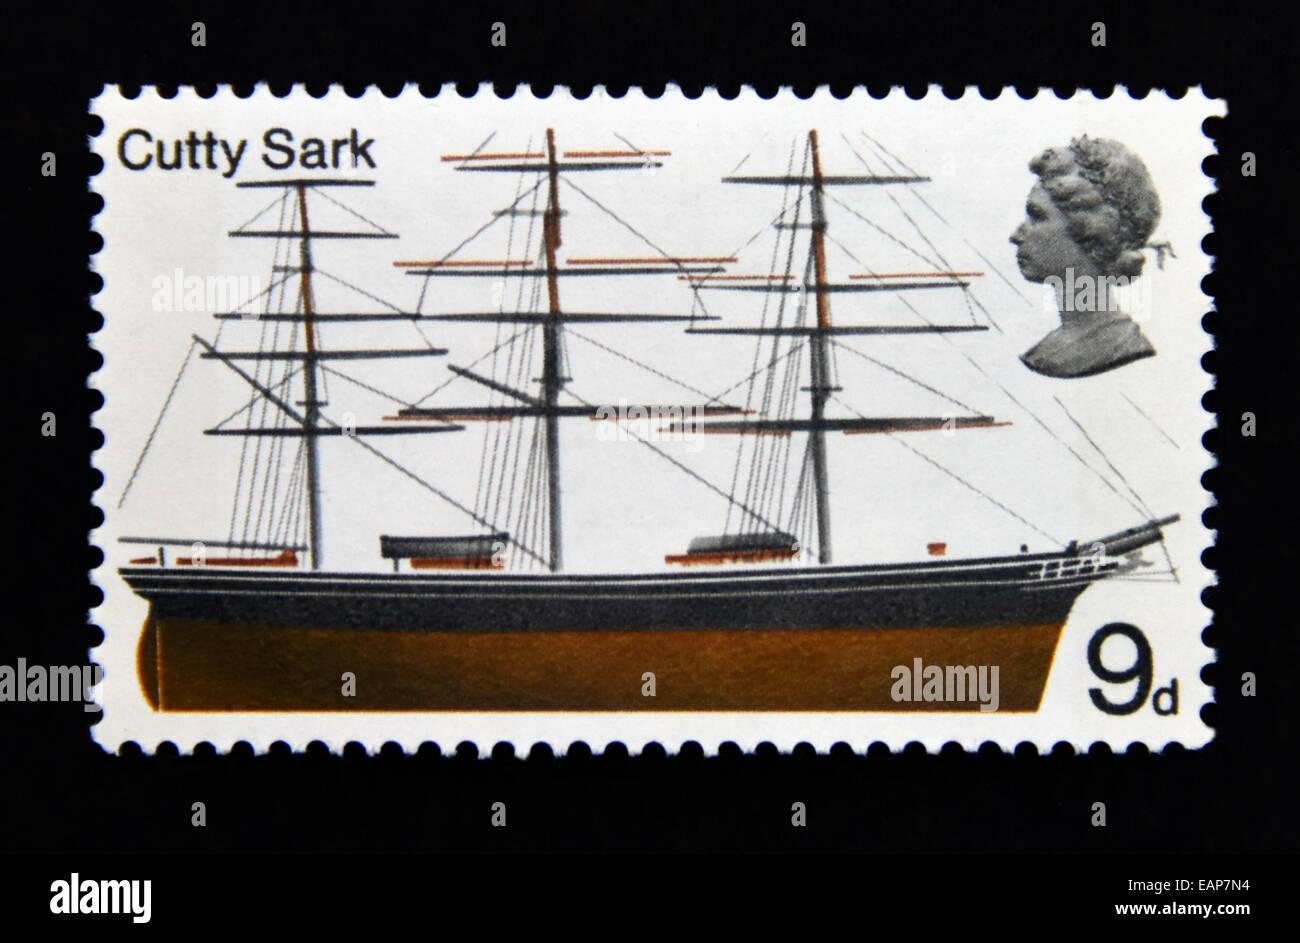 Postage stamp. Great Britain. Queen Elizabeth II. British Ships. 1969. Cutty Sark. 9d. - Stock Image